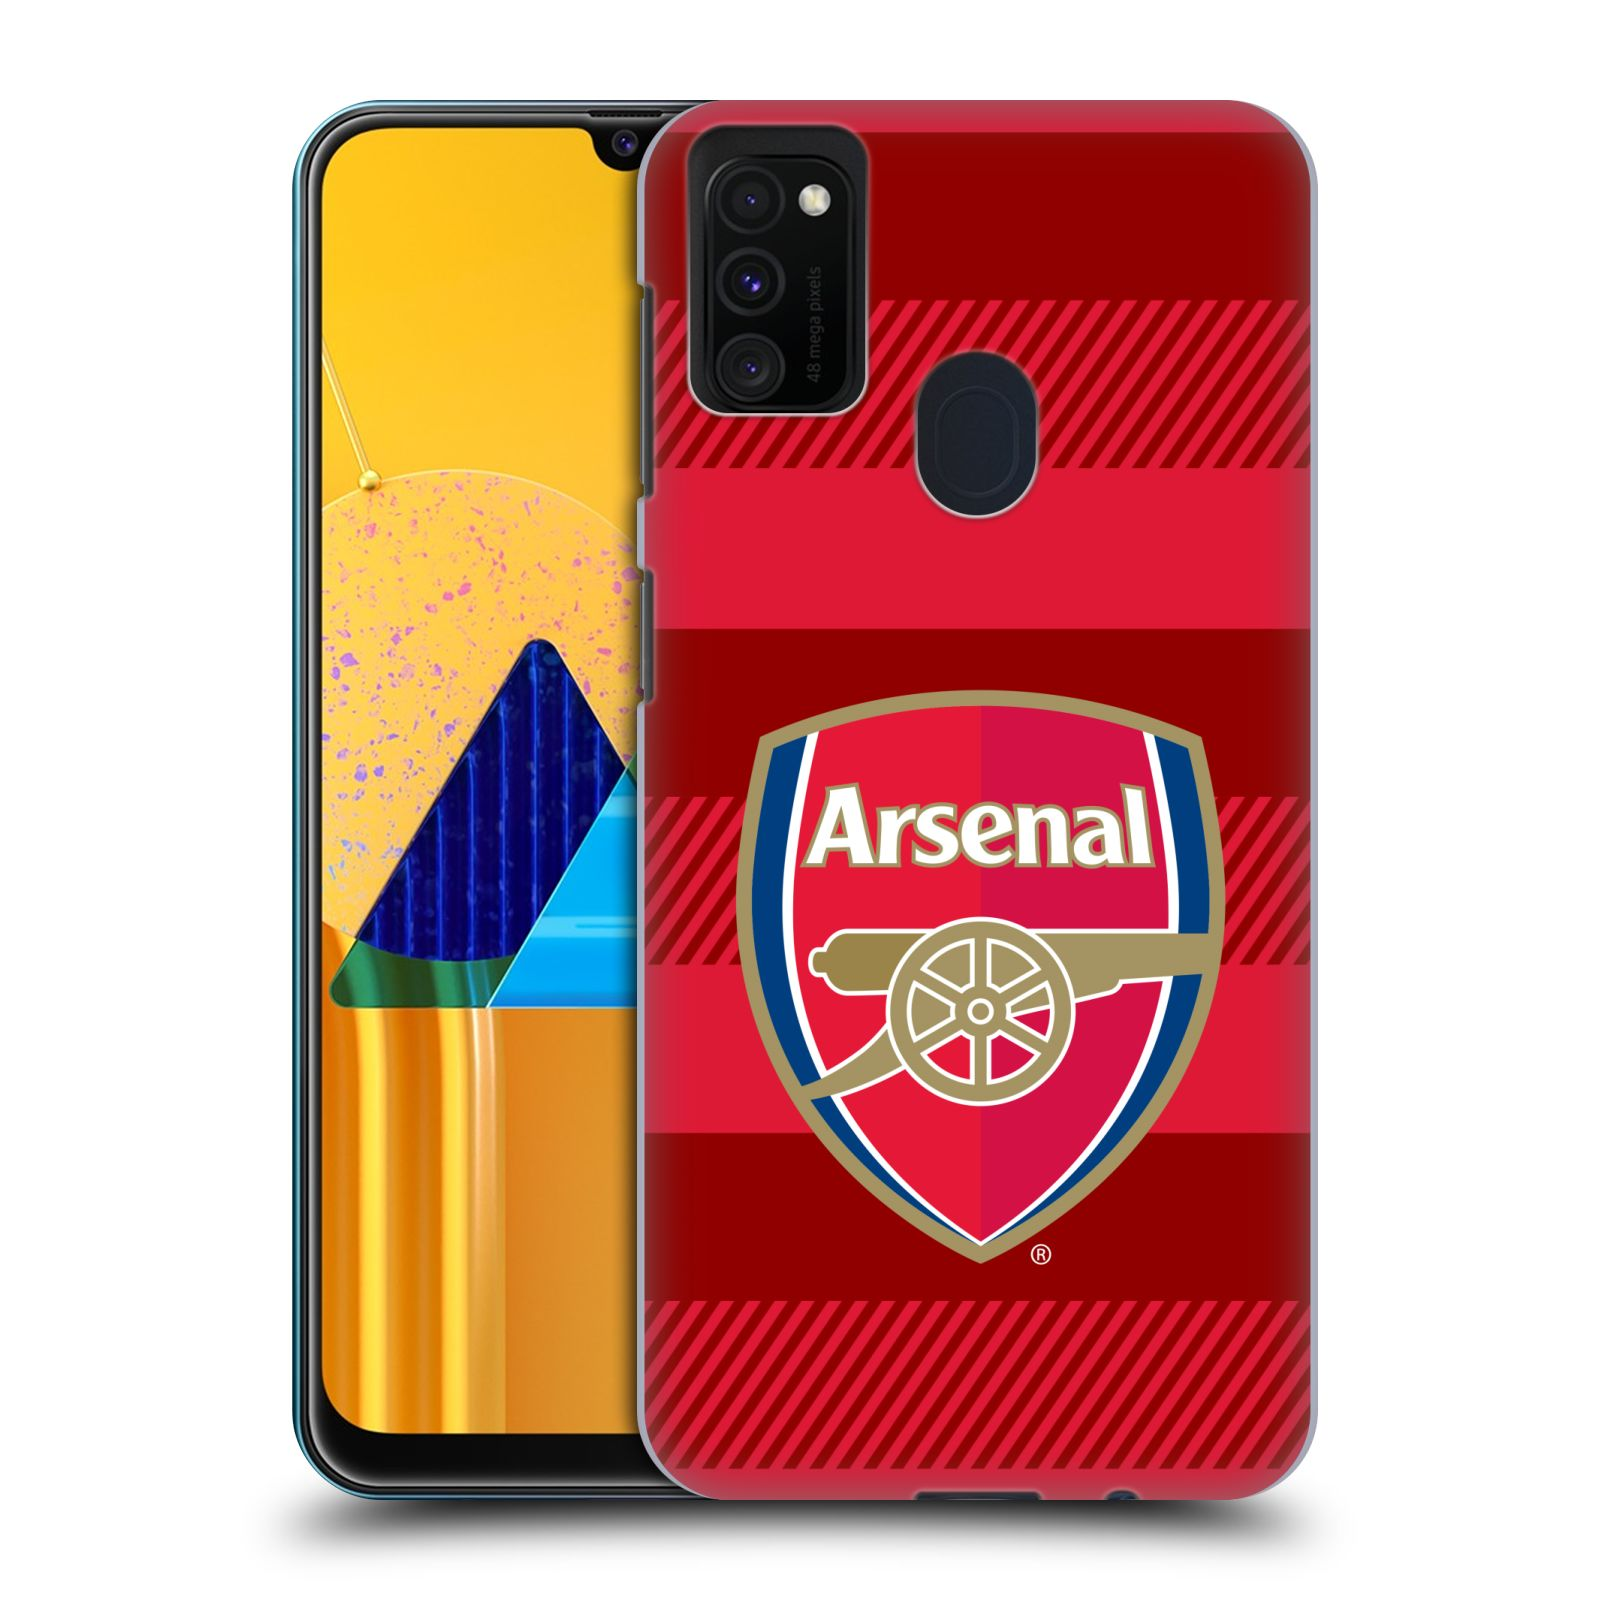 Plastové pouzdro na mobil Samsung Galaxy M21 - Head Case - Arsenal FC - Logo s pruhy